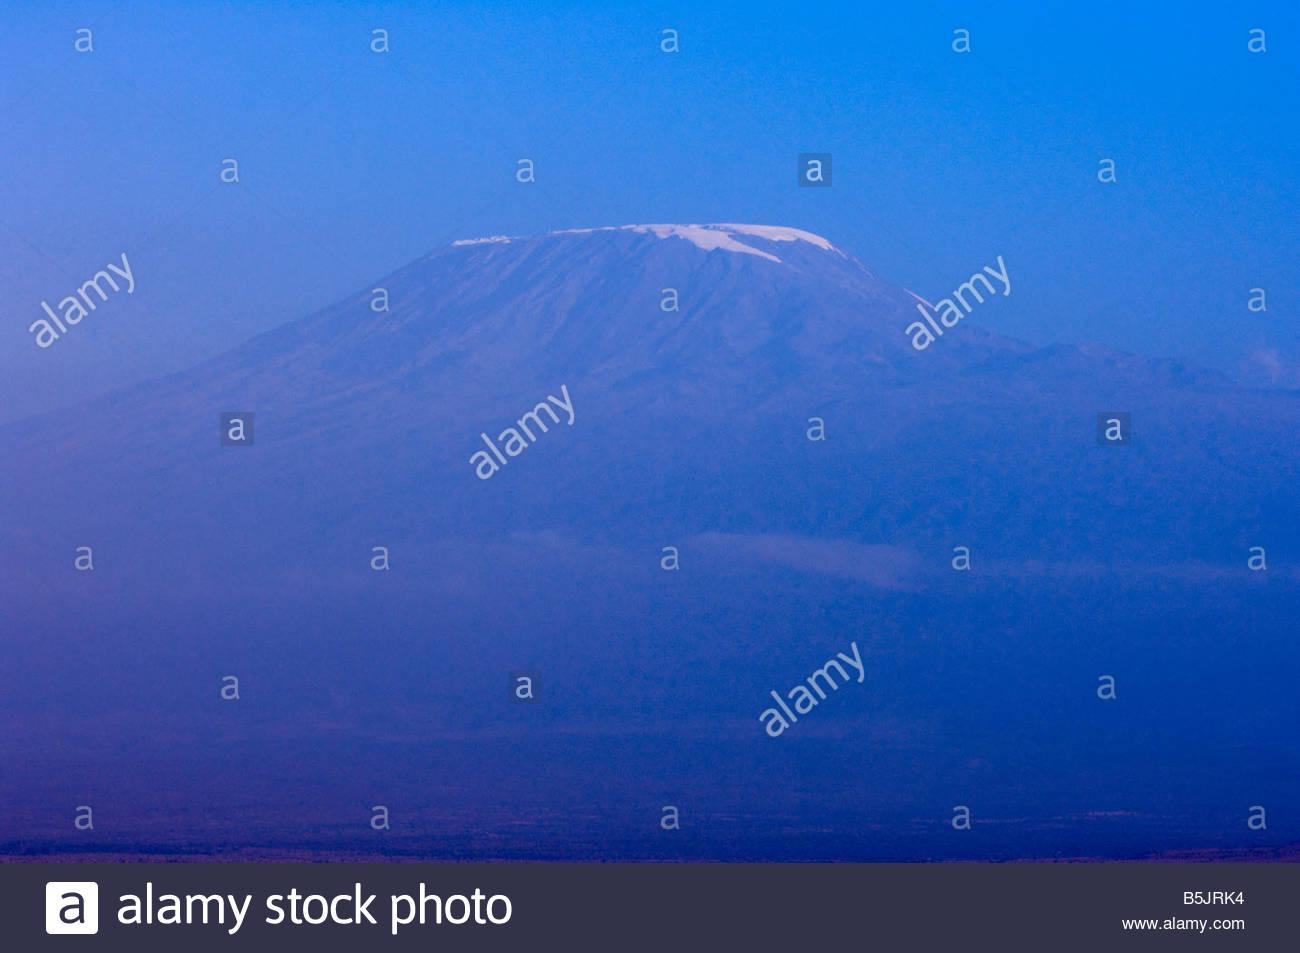 Mount Kilimanjaro seen from Amboseli National Park Kenya - Stock Image